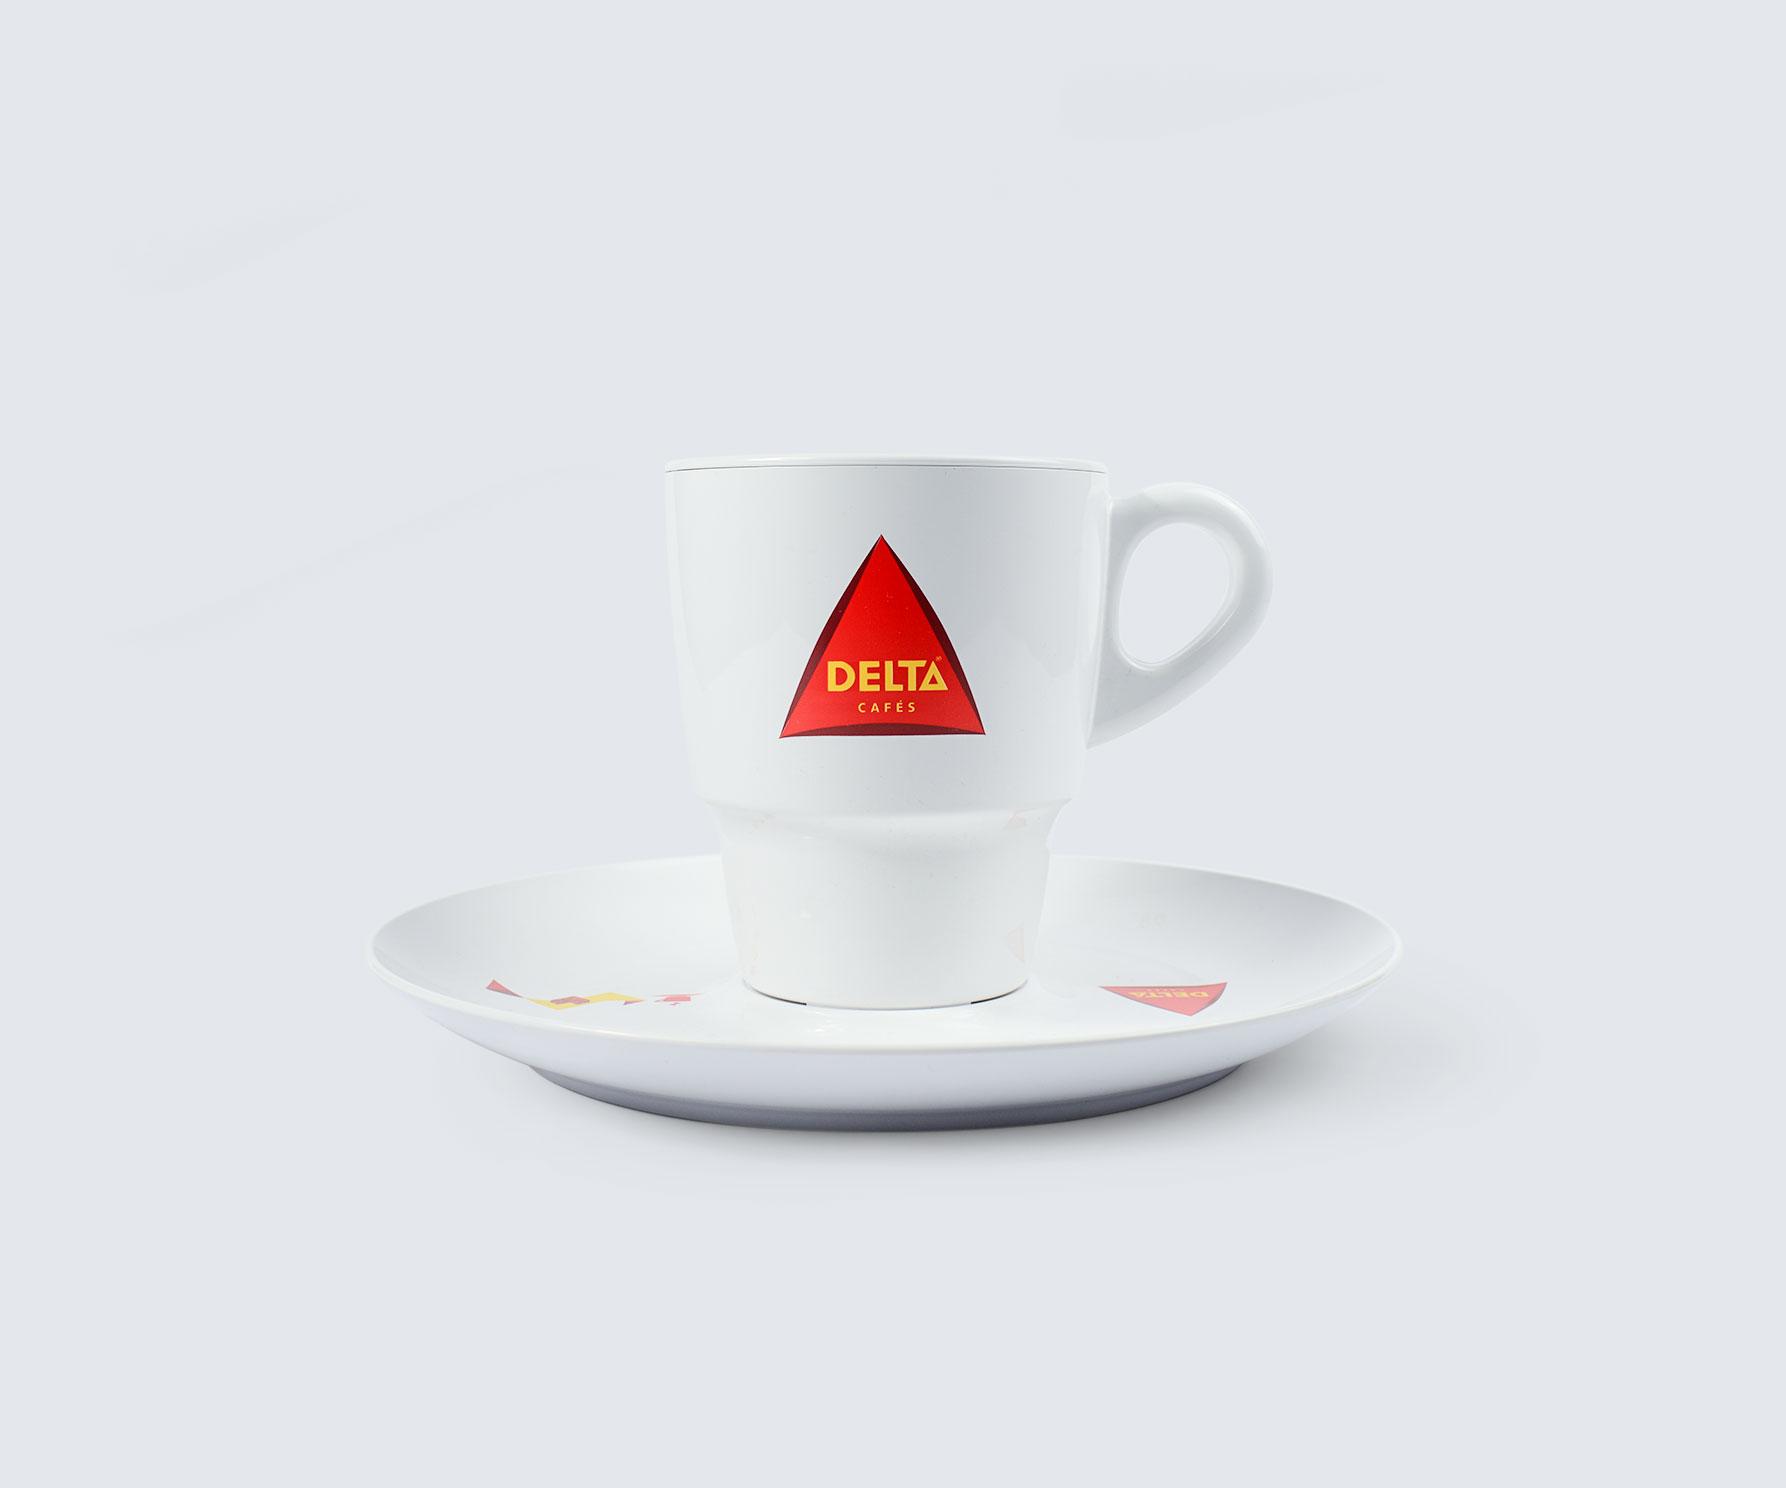 Delta café – Merchandising